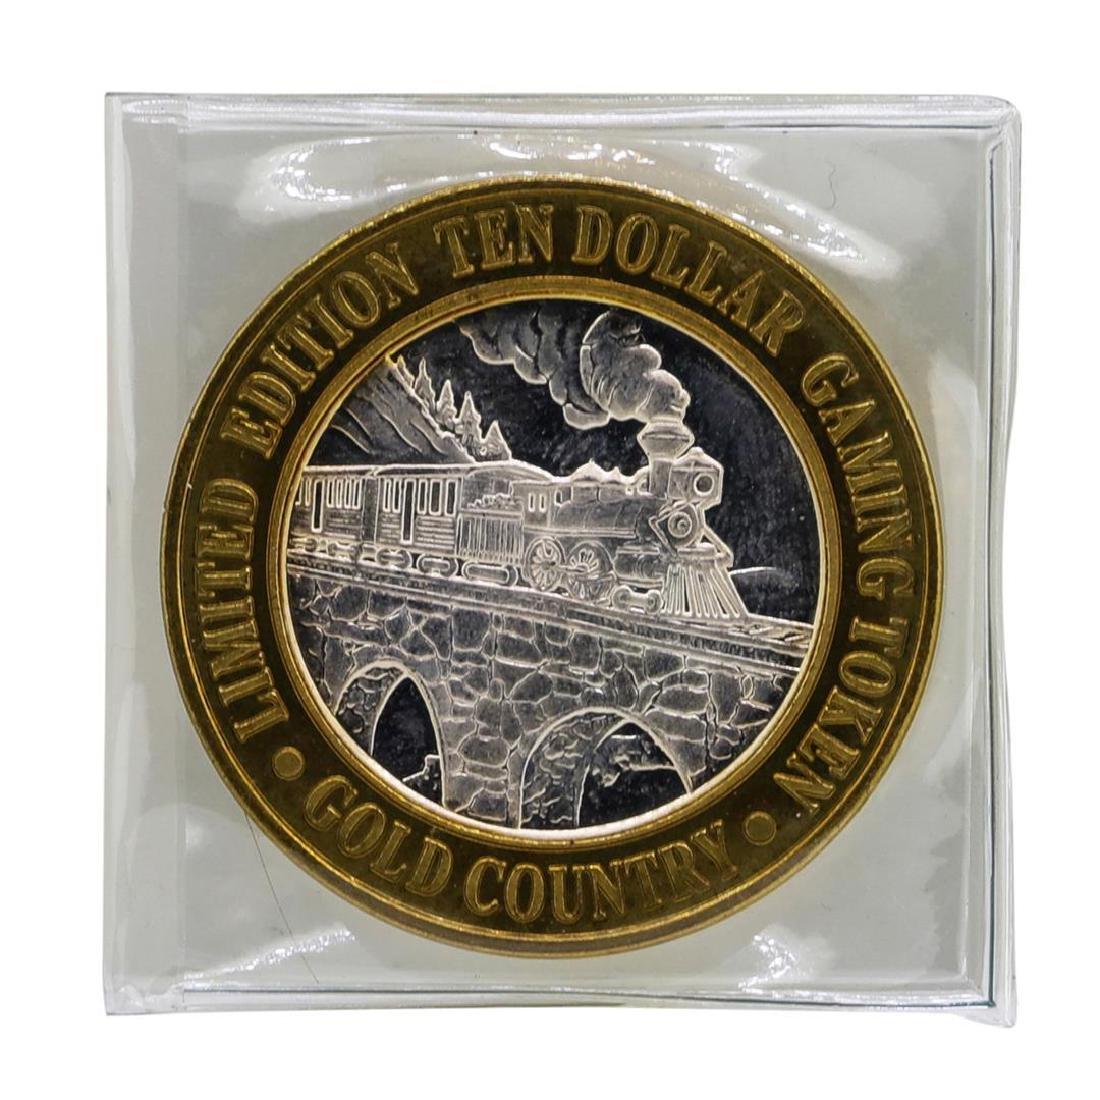 .999 Silver Gold Country Motor Inn Elko, NV $10 Limited